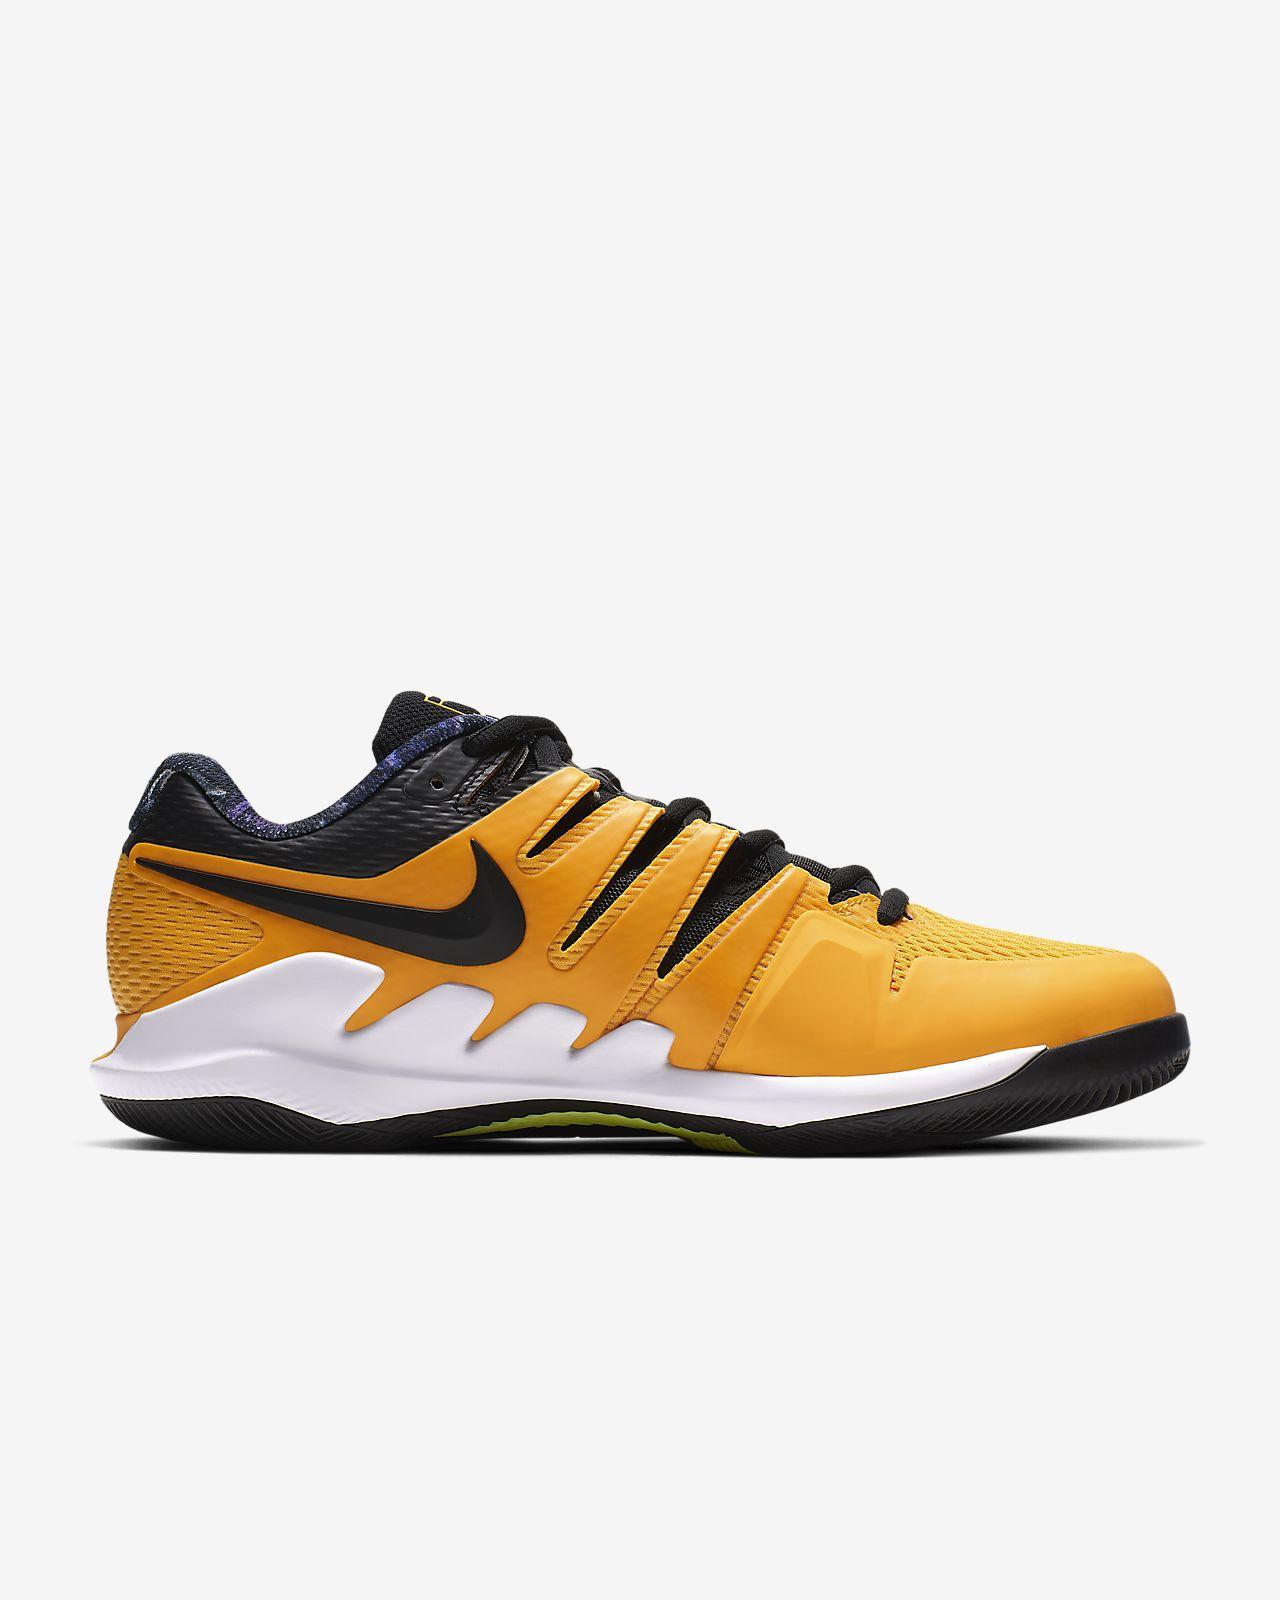 promo code 5a1e0 7c139 ... NikeCourt Air Zoom Vapor X Herren-Tennisschuh für Hartplätze